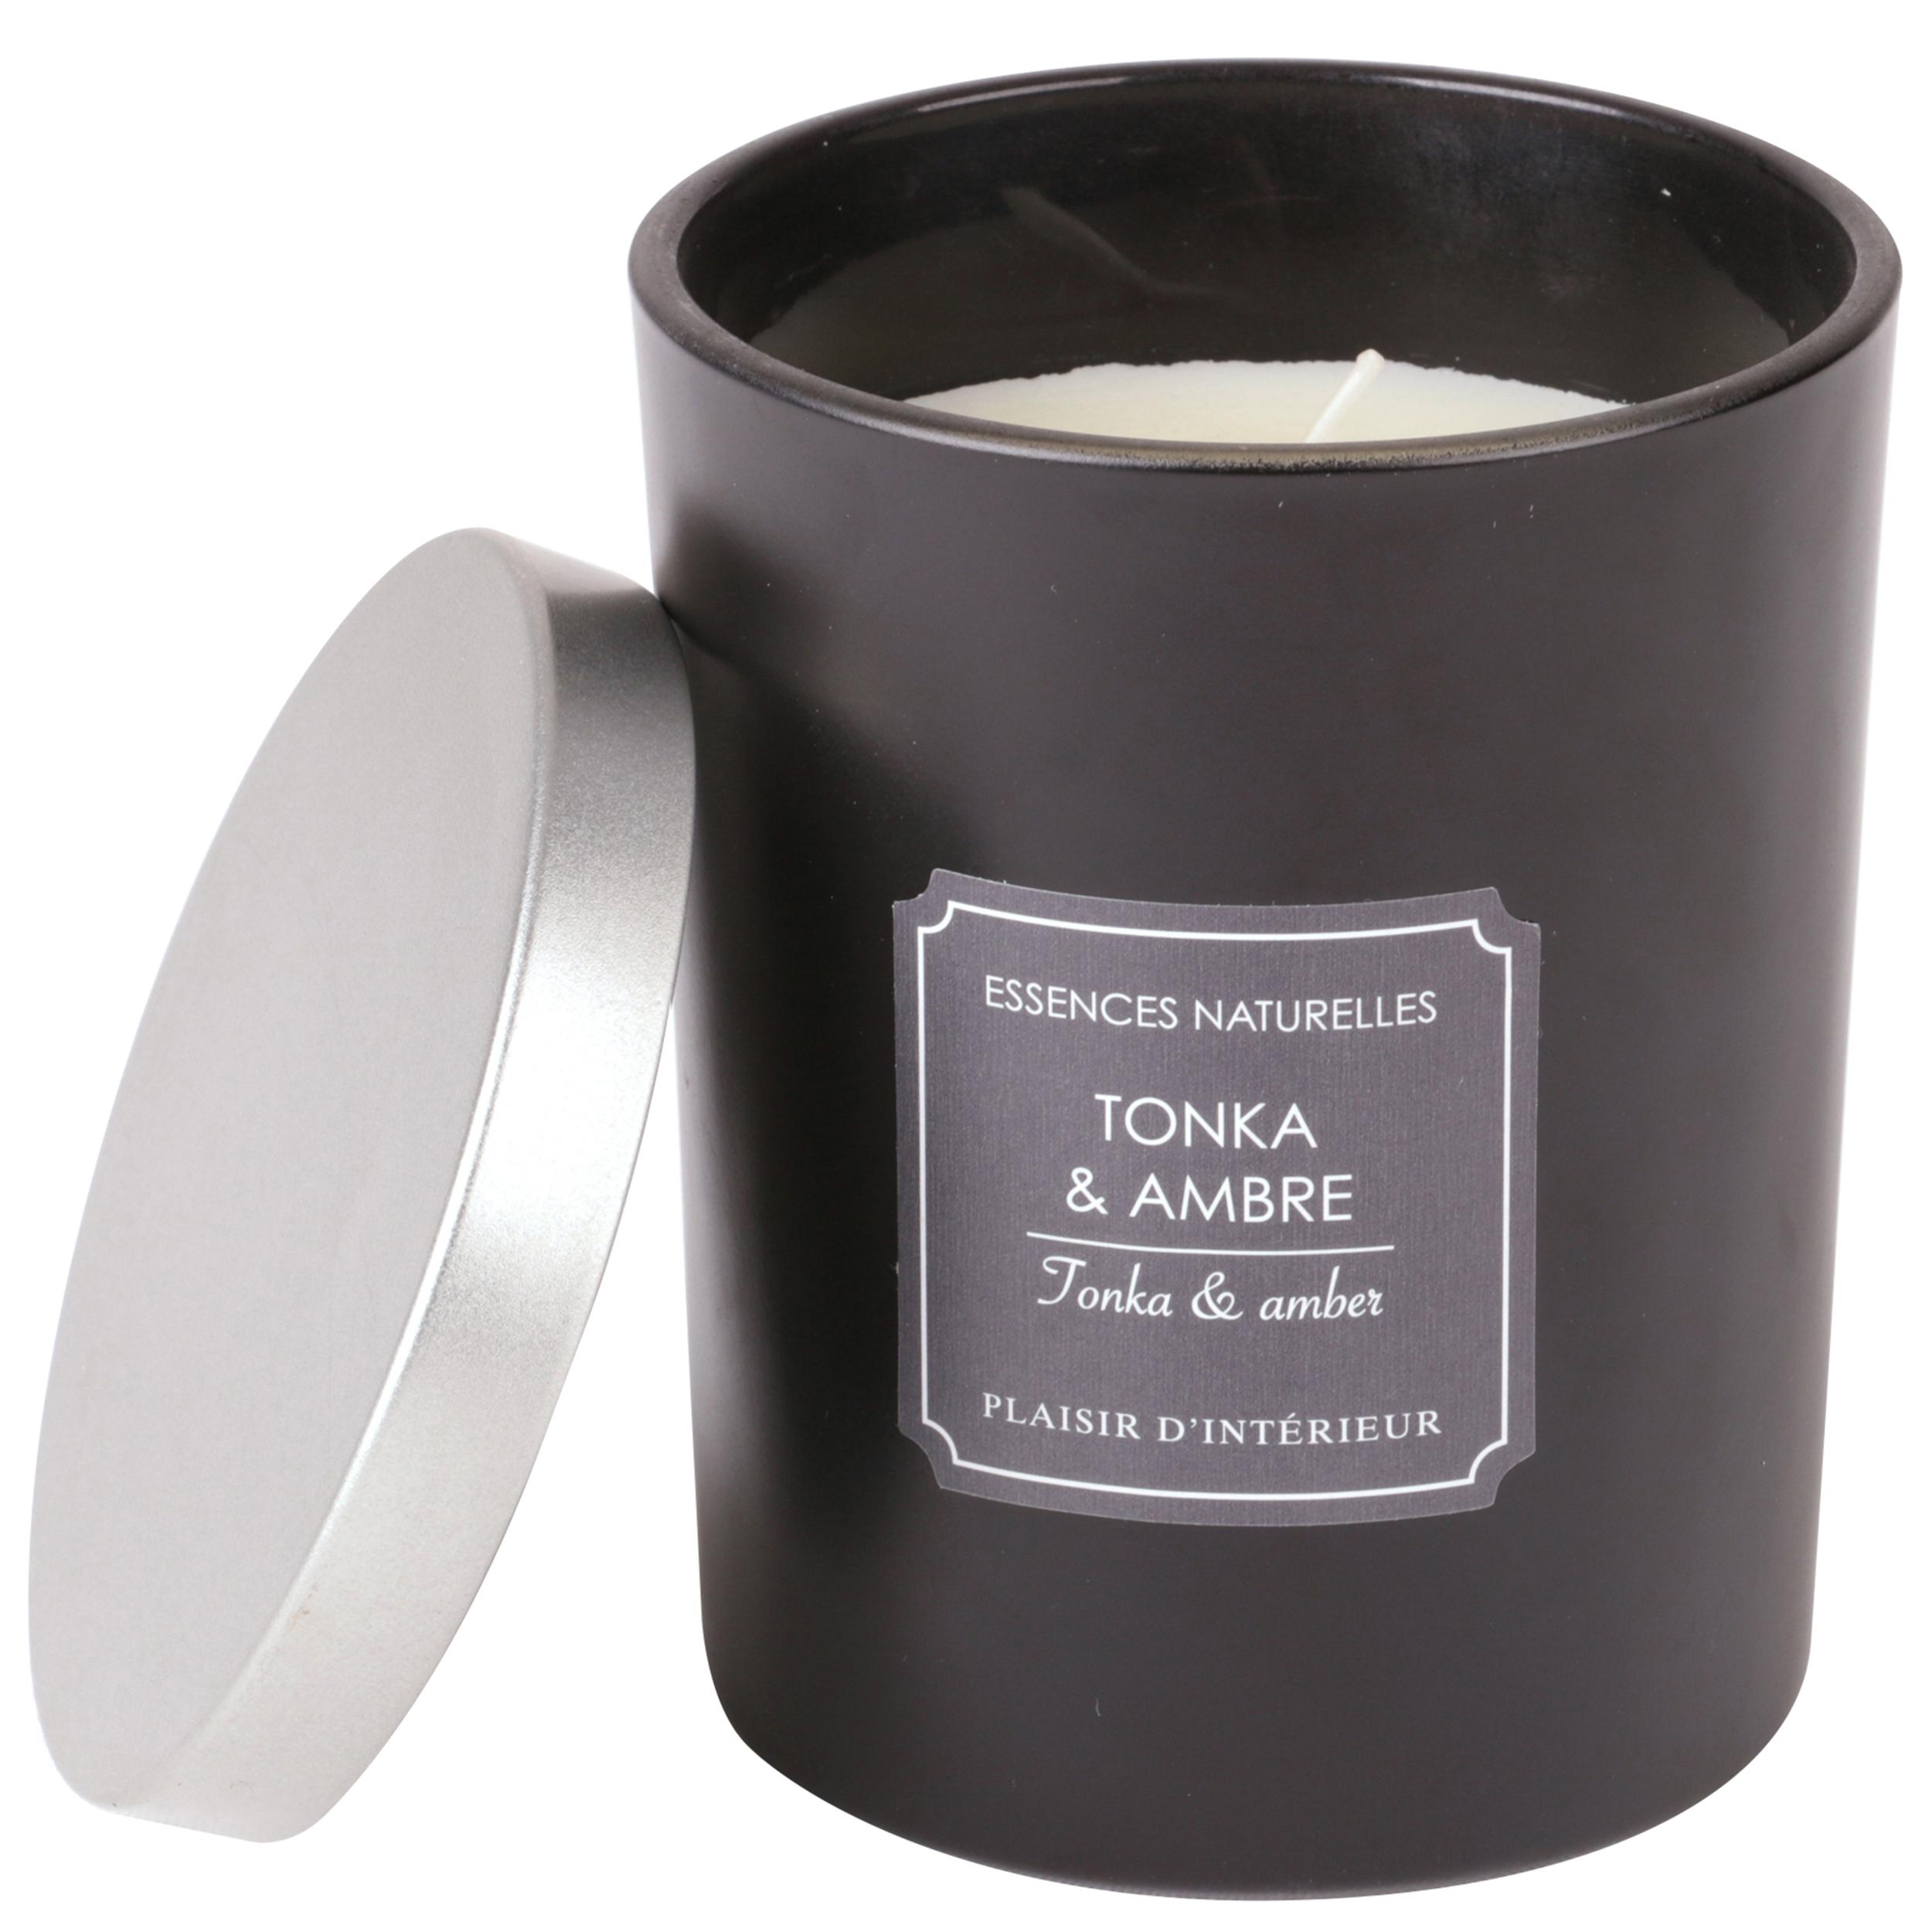 BOUGIE PARFUMEE TONKA & AMBRE (L)